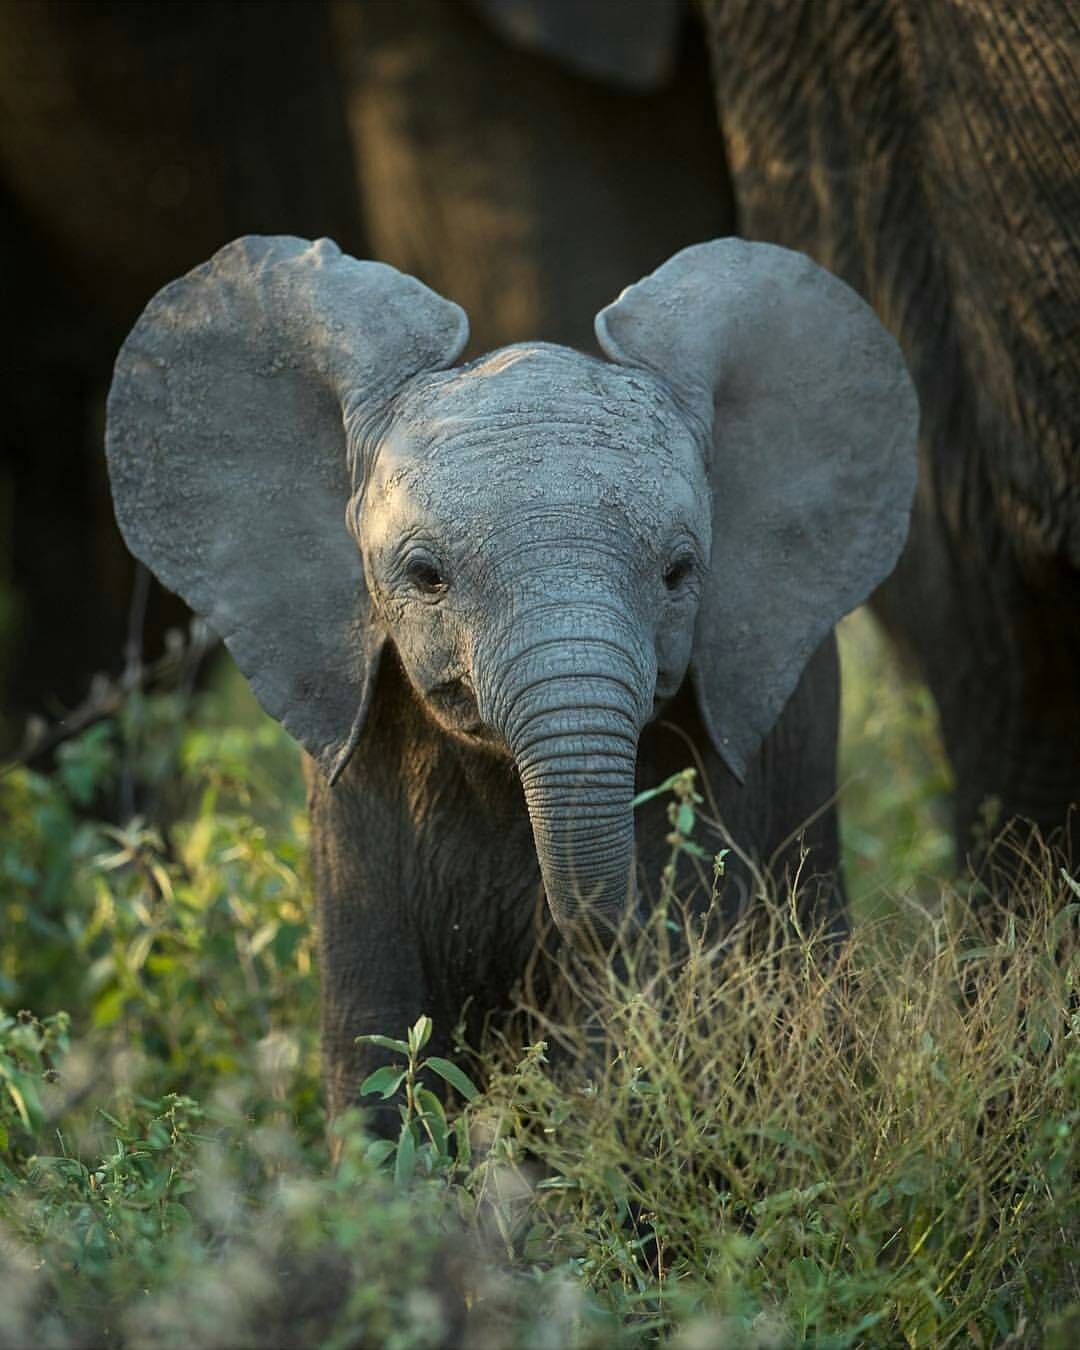 Little Big Ears Photo By Marlondutoit Thisissouthafrica Cute